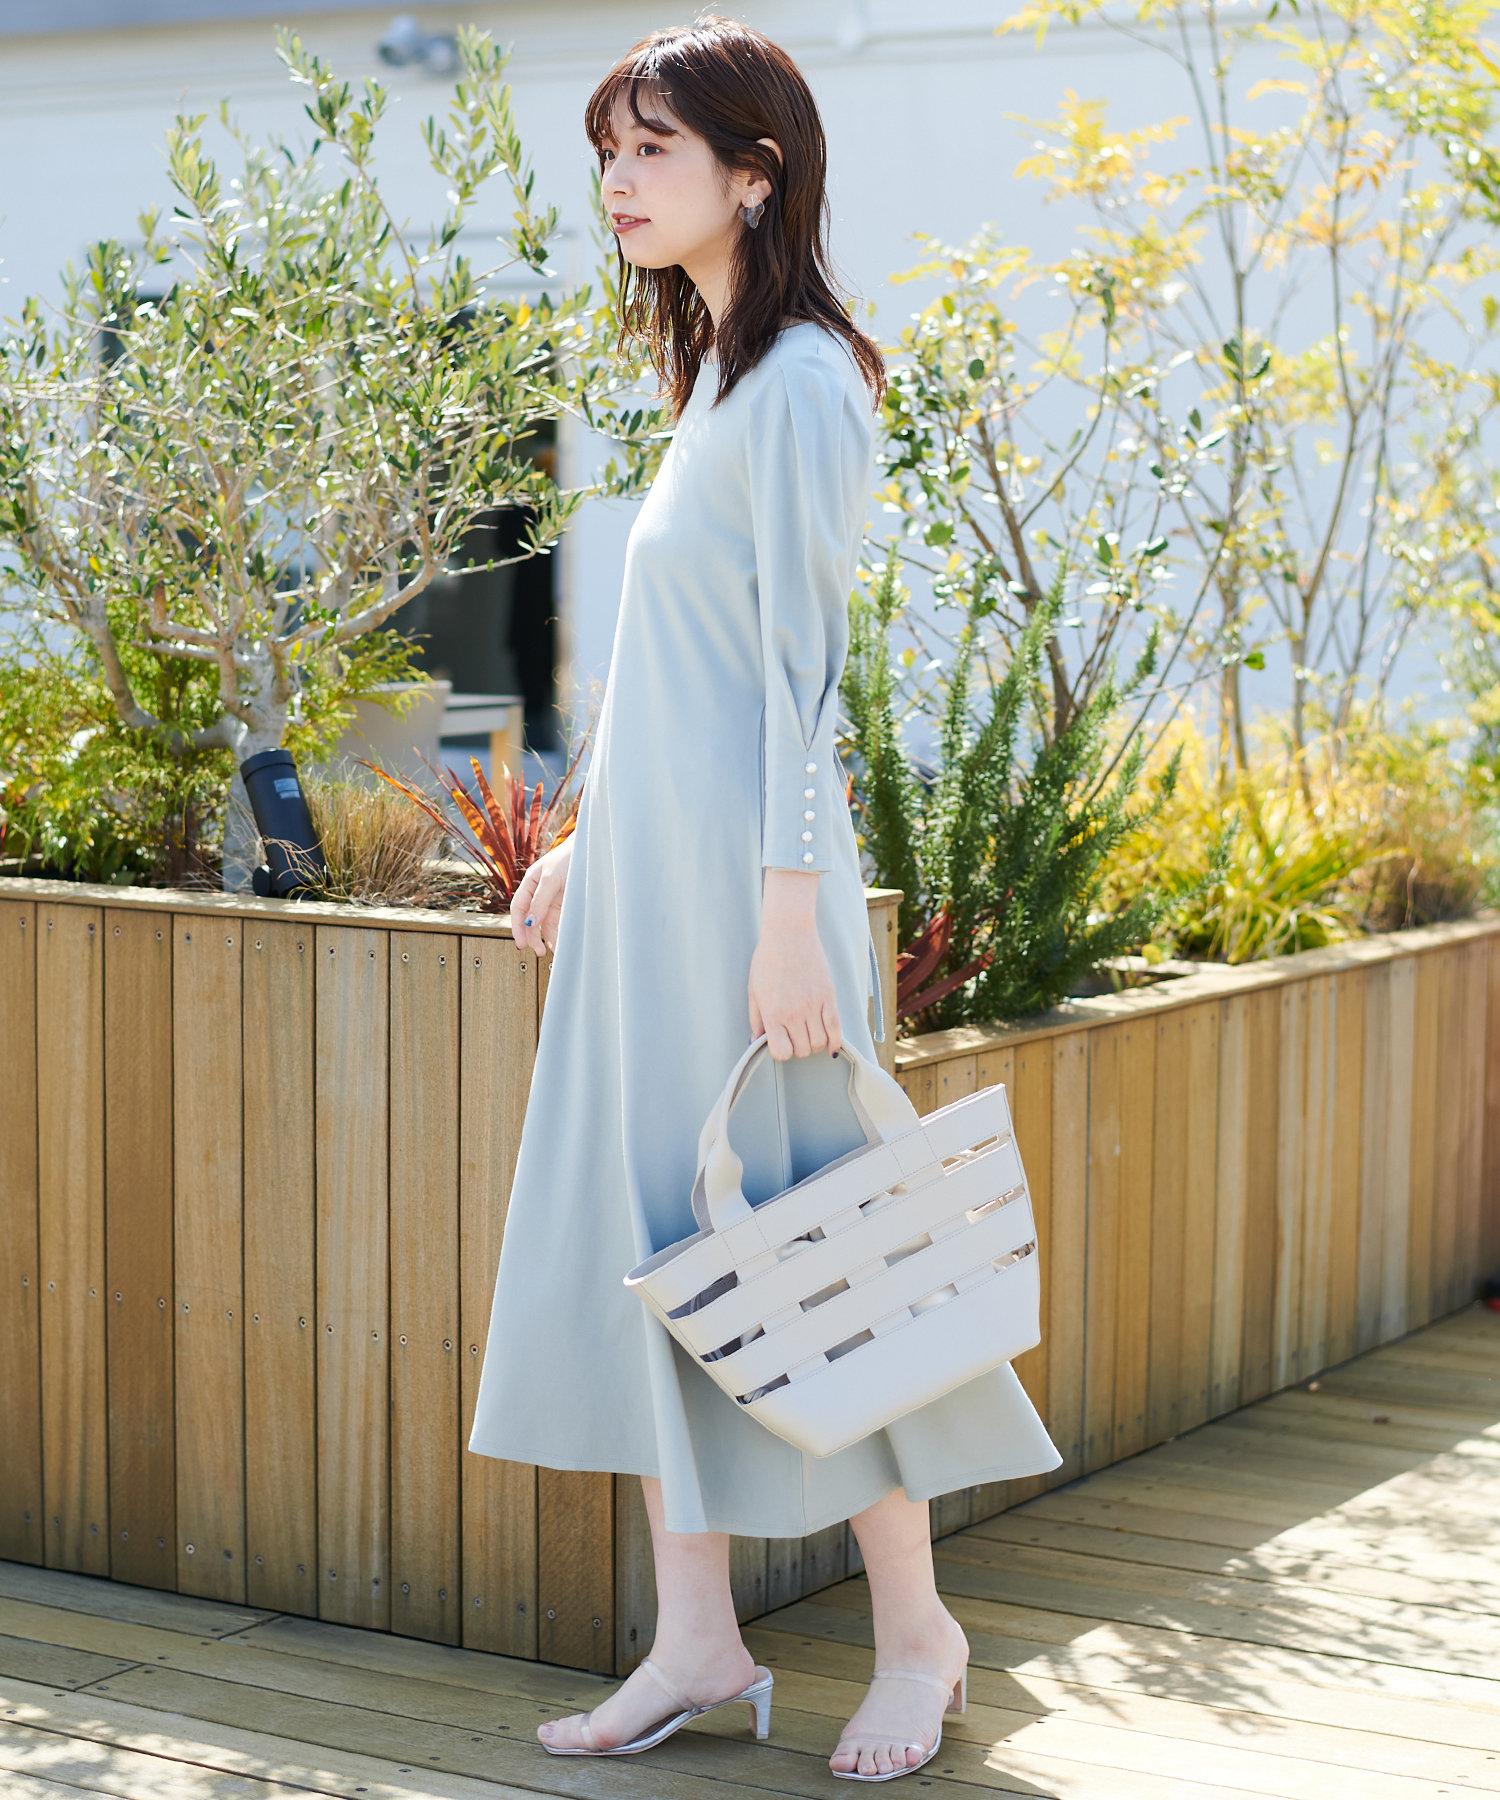 natural couture(ナチュラルクチュール) 【WEB限定】袖口パールカットフレアワンピース